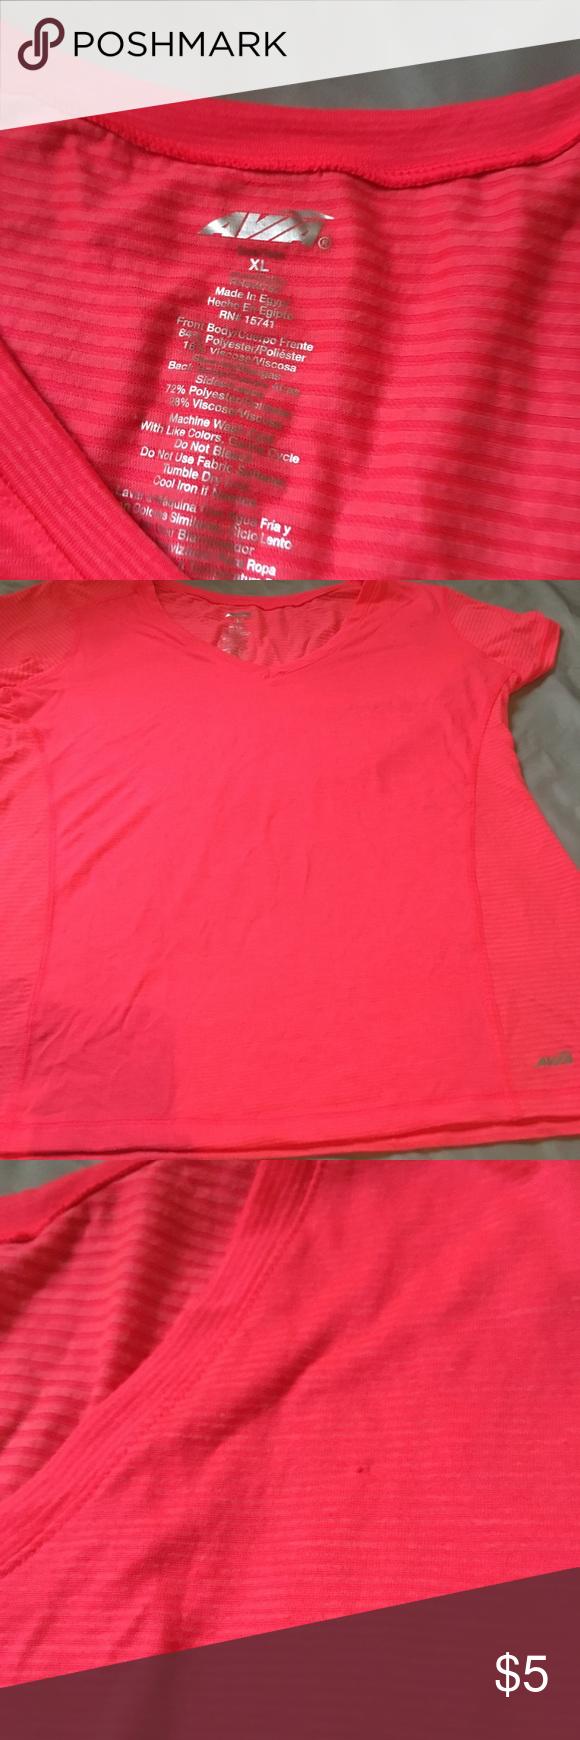 Work out shirt Work out shirt, small snag near left shoulder Avia Tops Tees - Short Sleeve